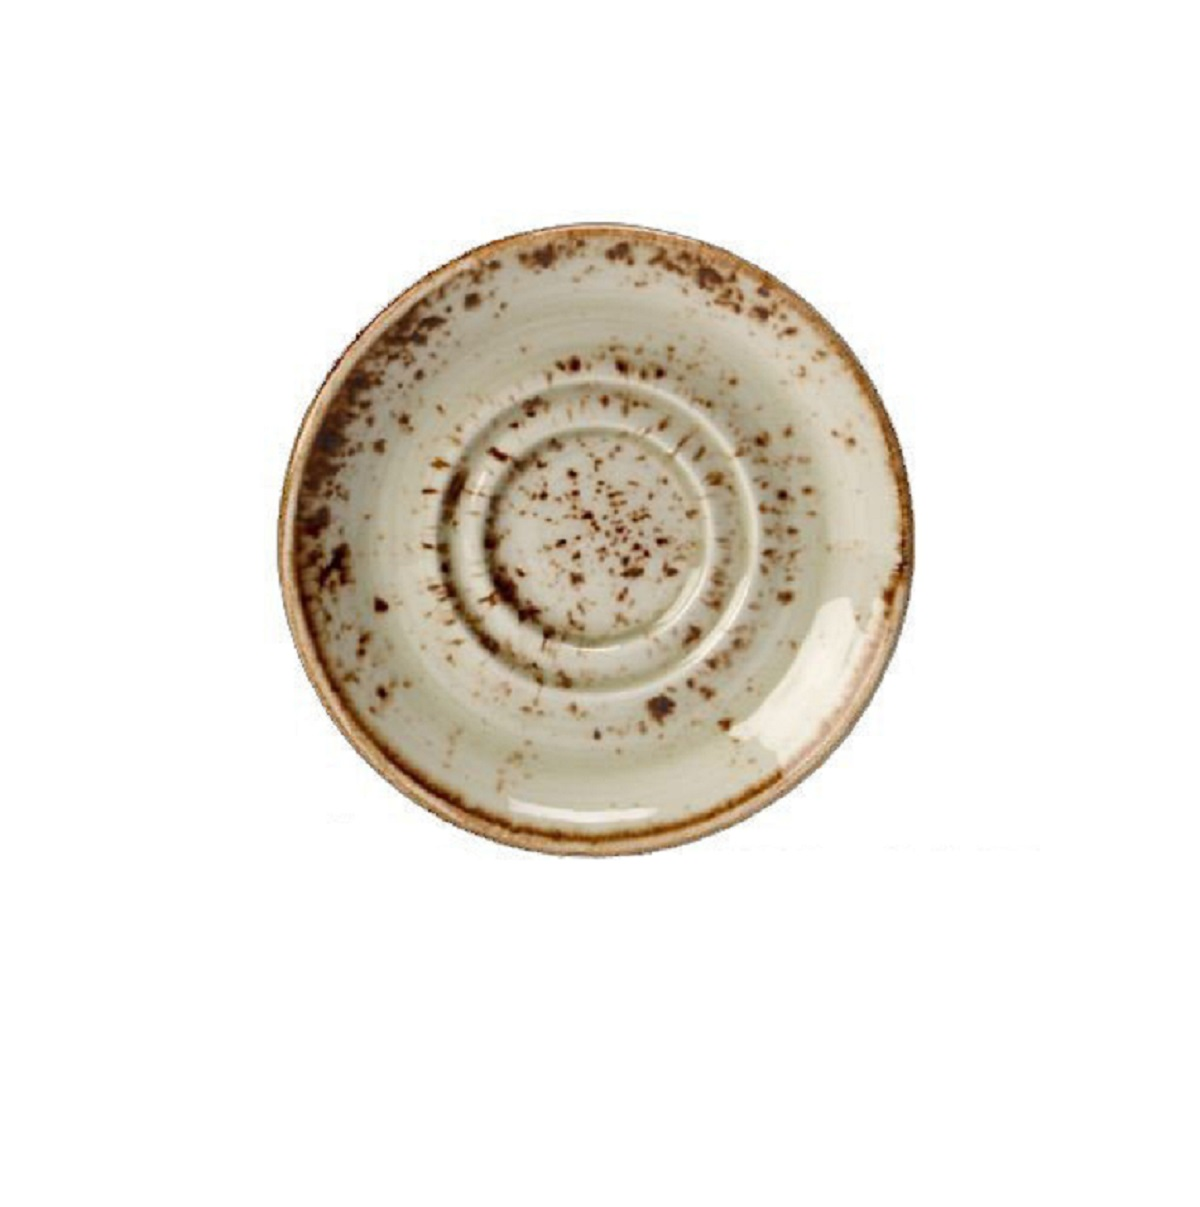 Онлайн каталог PROMENU: Блюдце фарфоровое Steelite CRAFT PORCINI, диаметр 14,5 см, бежевый